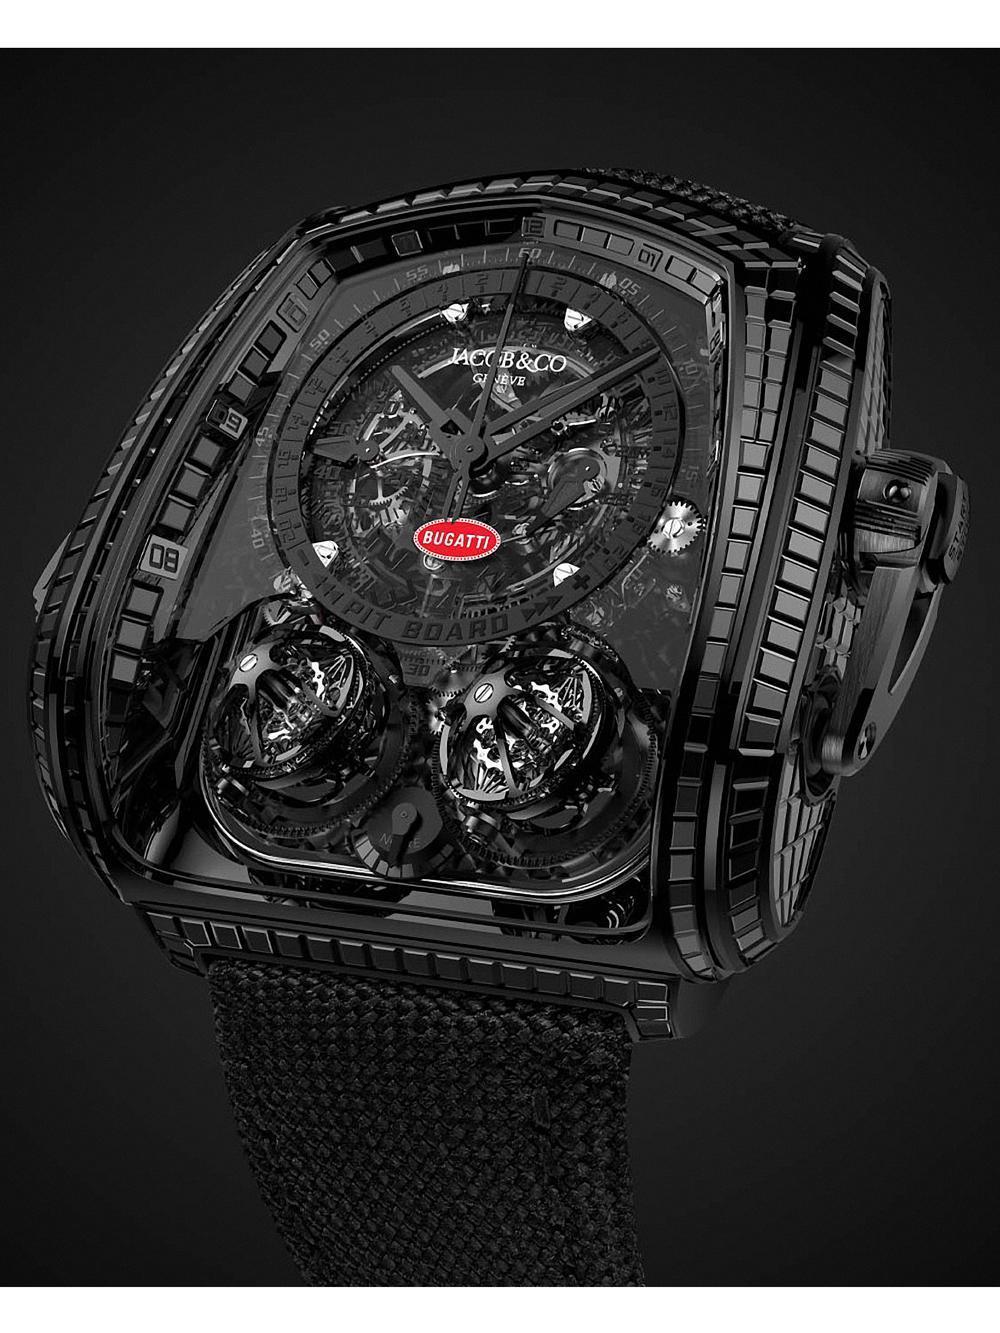 BUGATTI La Montre Noire採用了18k黑金和黑鈦作為錶殼材質。